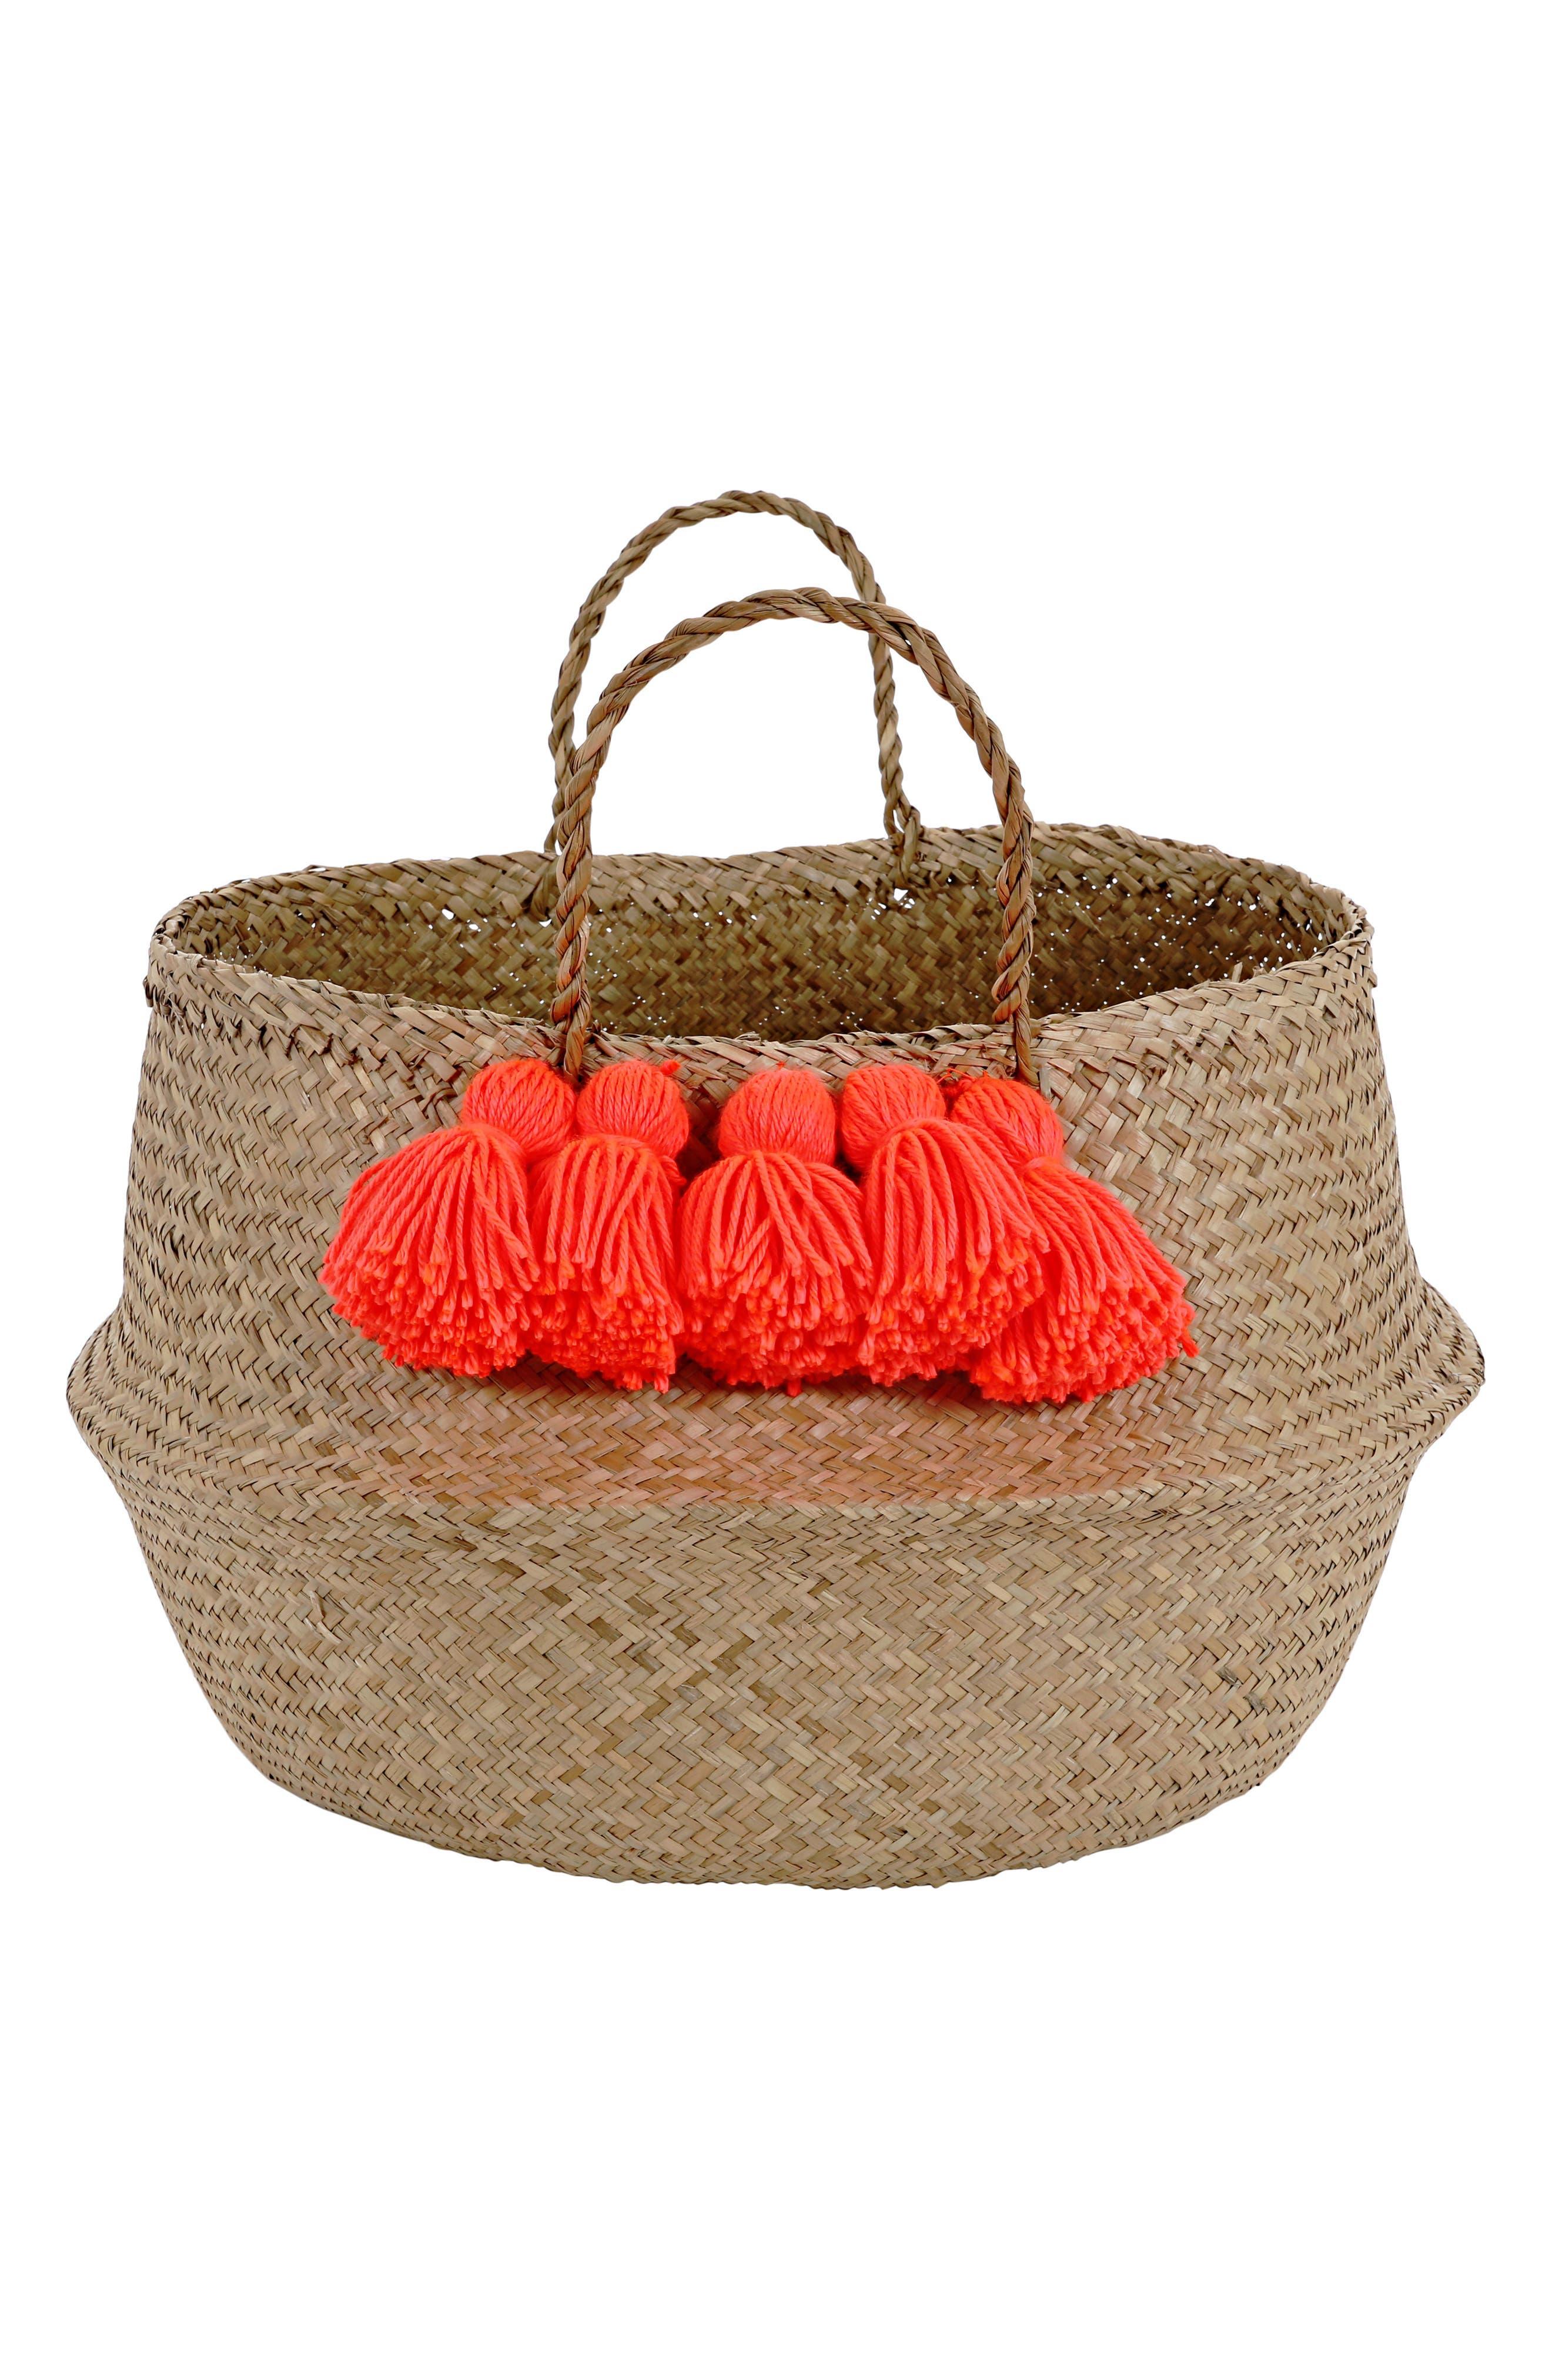 Meri Meri Tassel Basket